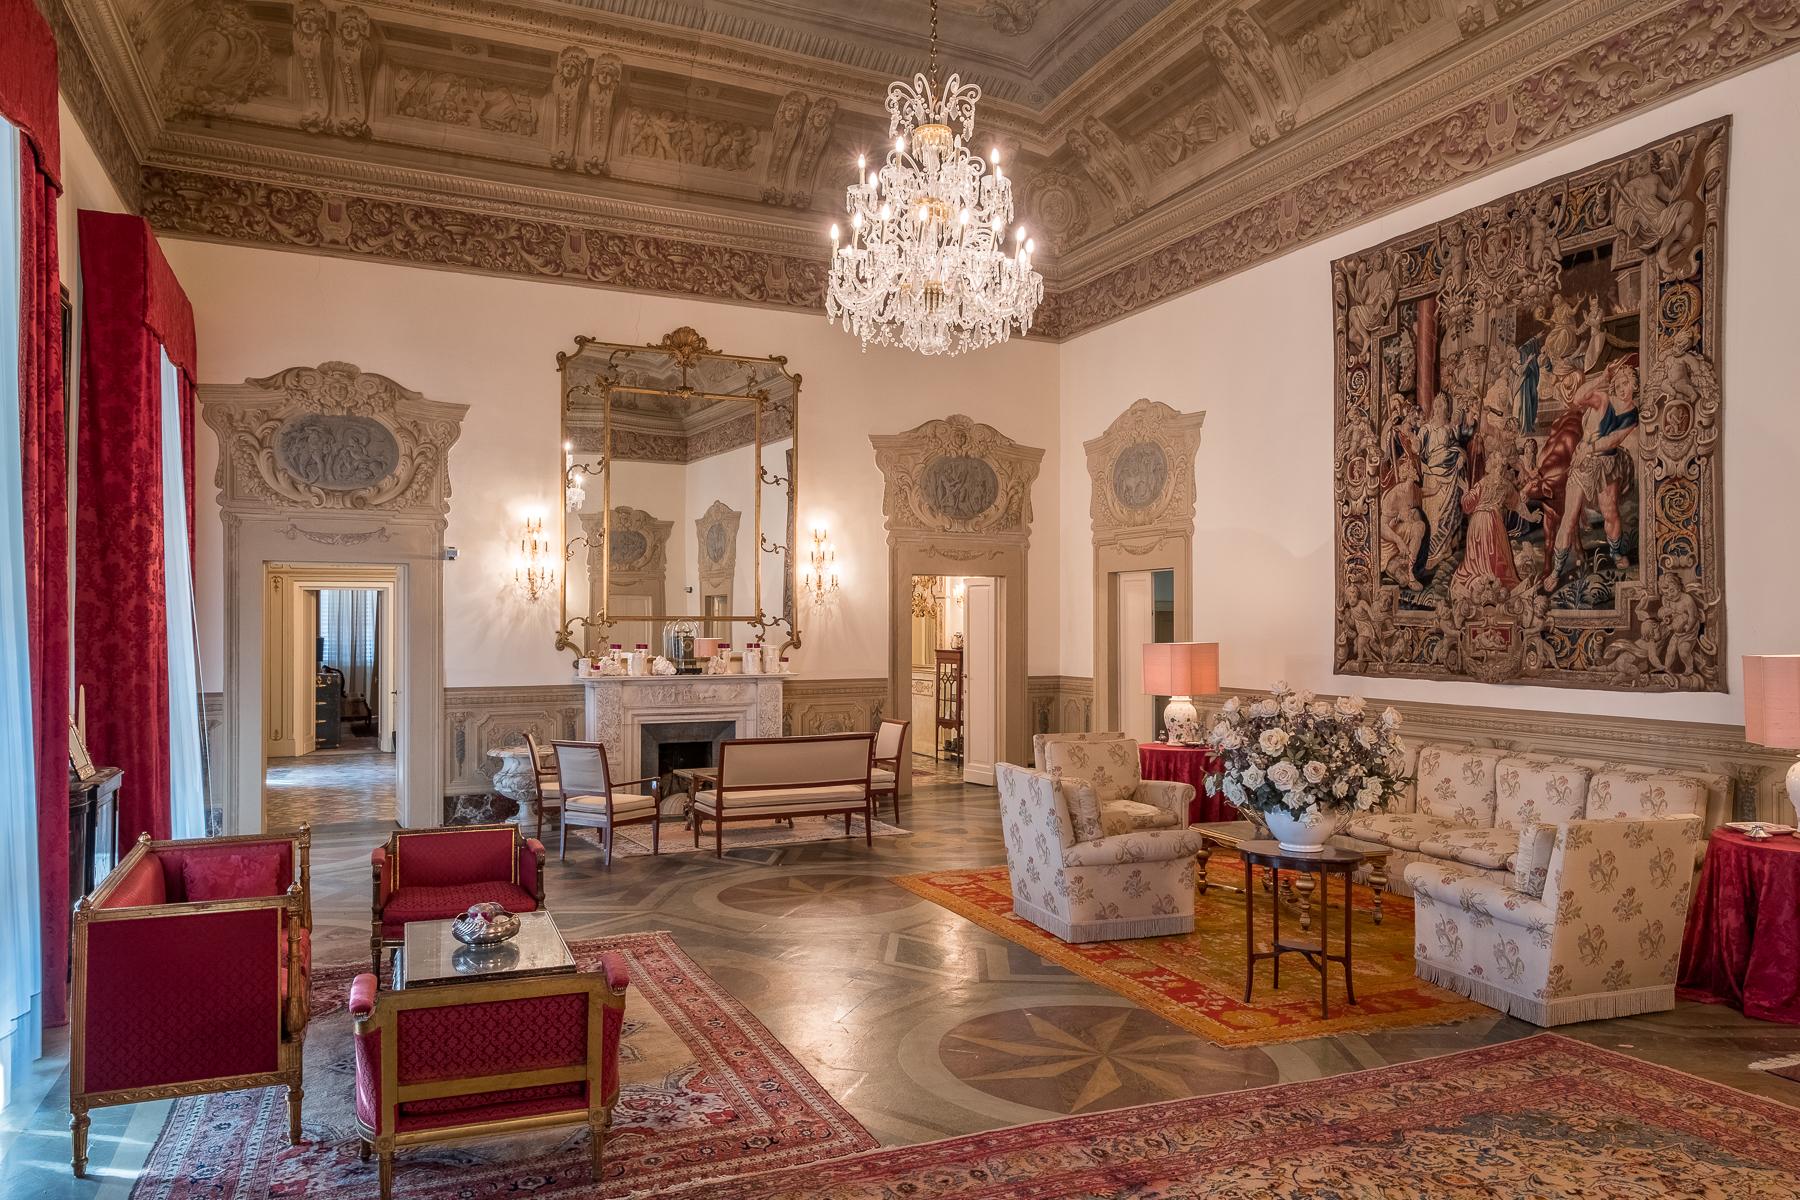 Appartamento in Vendita a Firenze Periferia Ovest: 5 locali, 500 mq